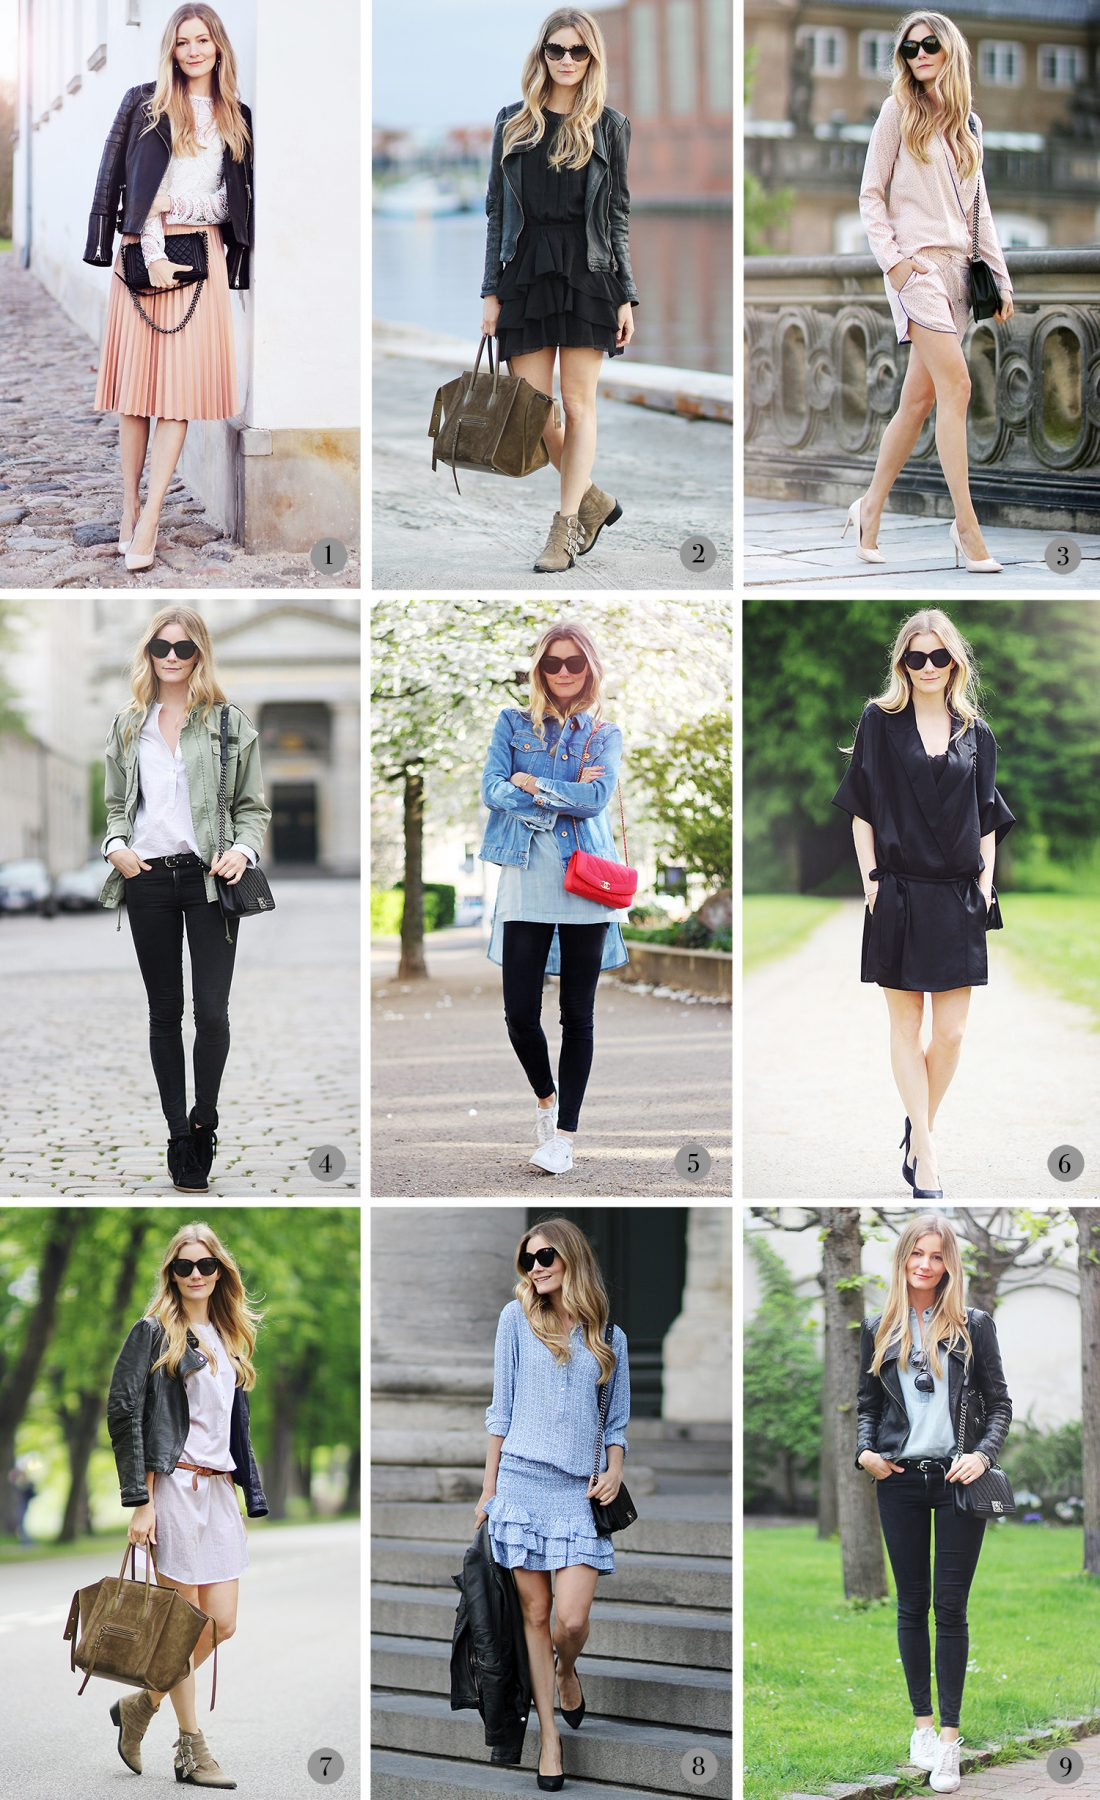 outfit-modeblog-fashion-blog@2x.jpg